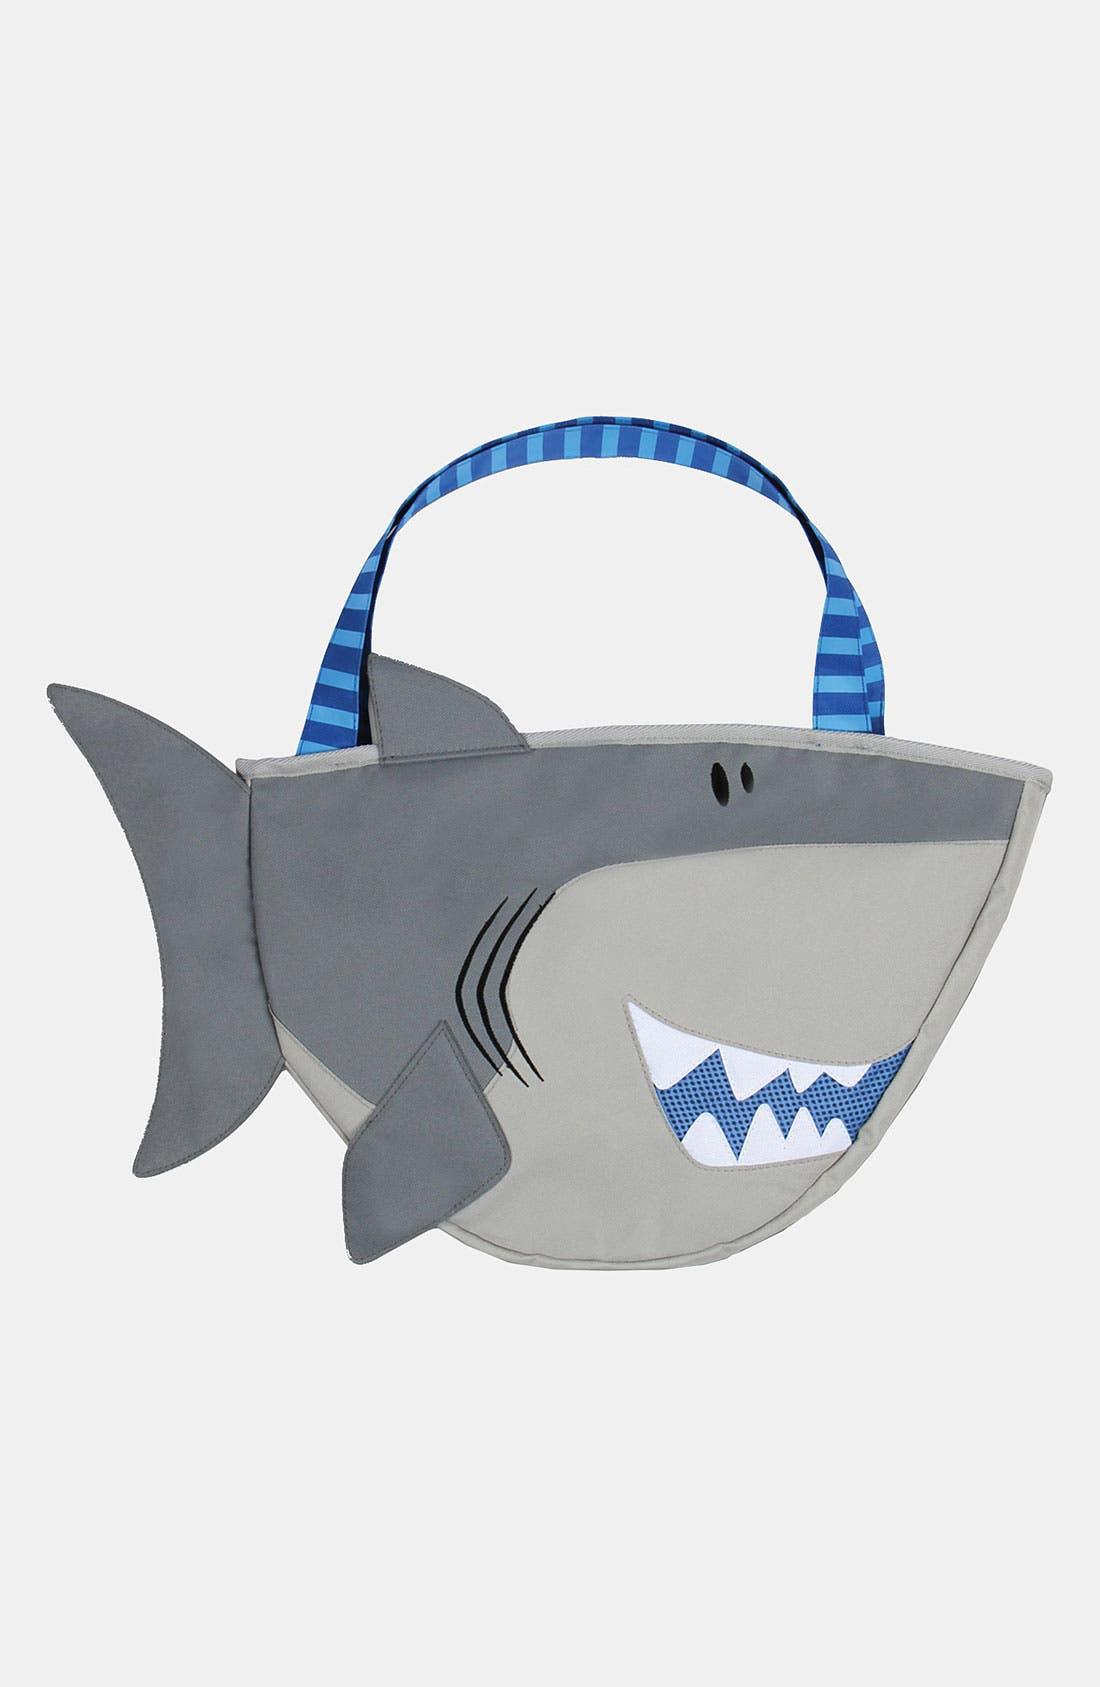 Main Image - Stephen Joseph 'Shark' Beach Tote & Toys